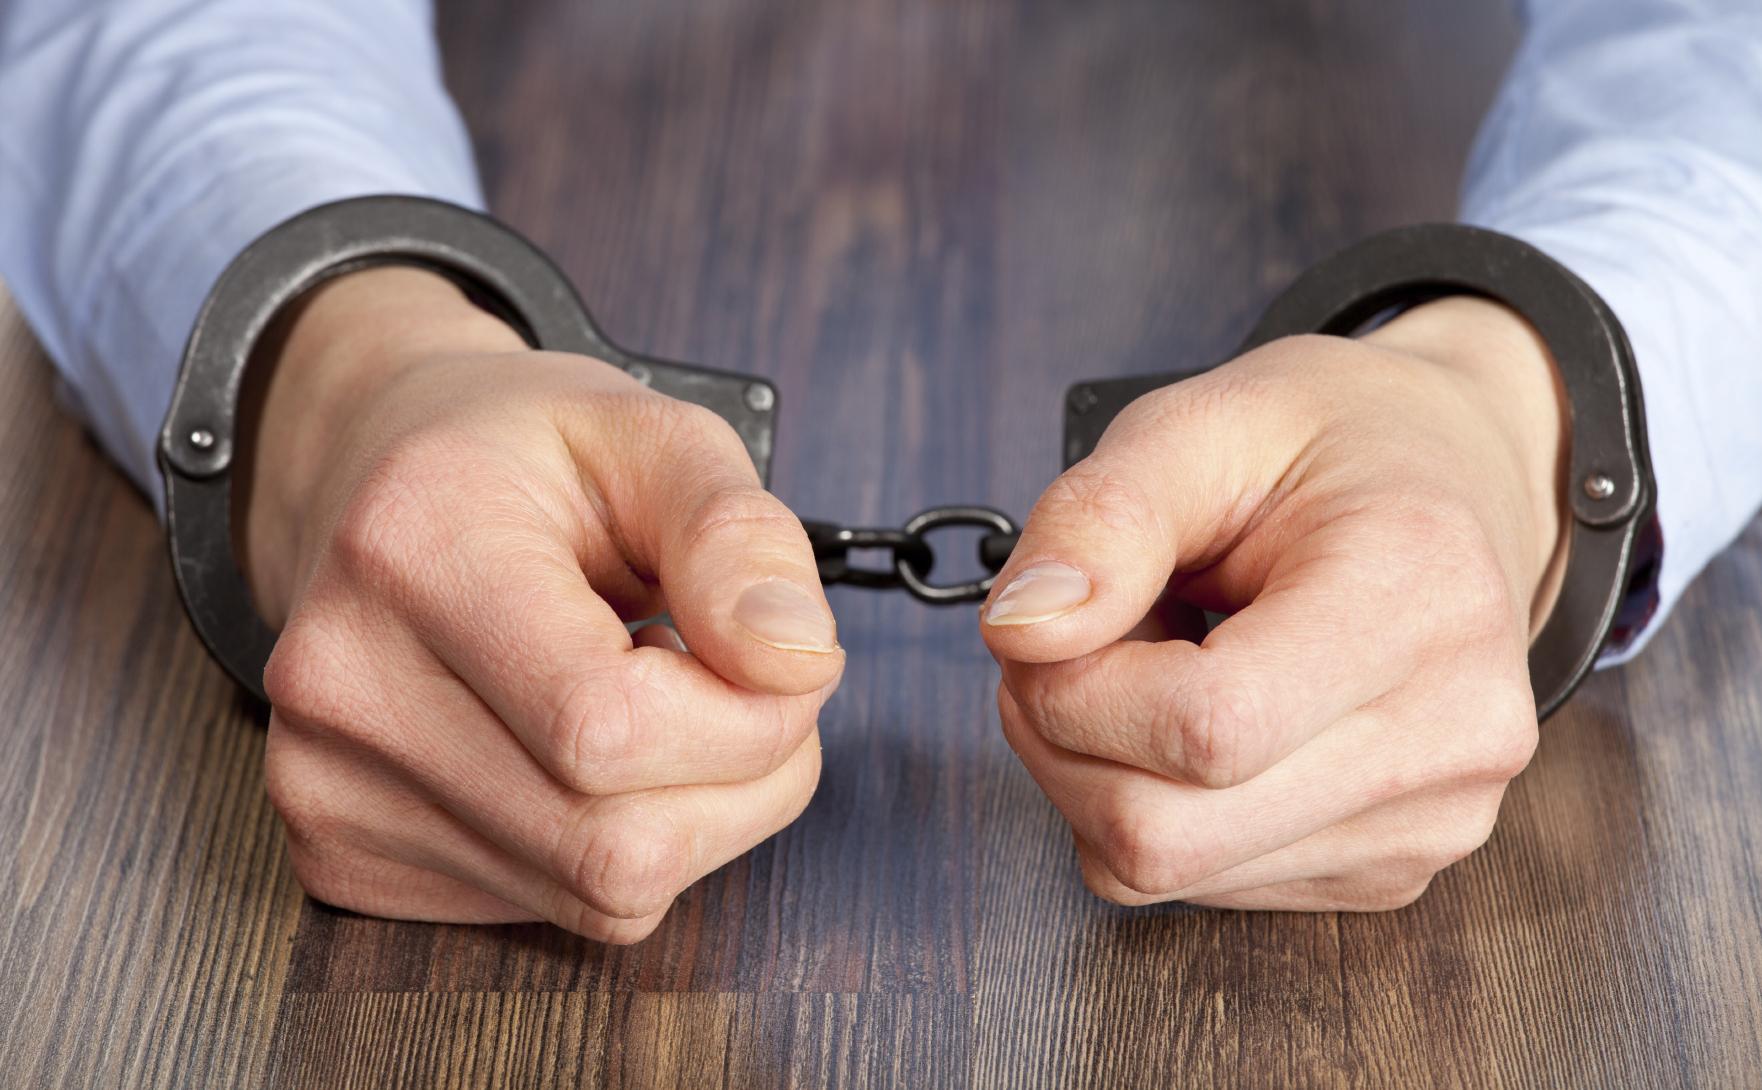 criminal-defense.jpg (1762×1090)